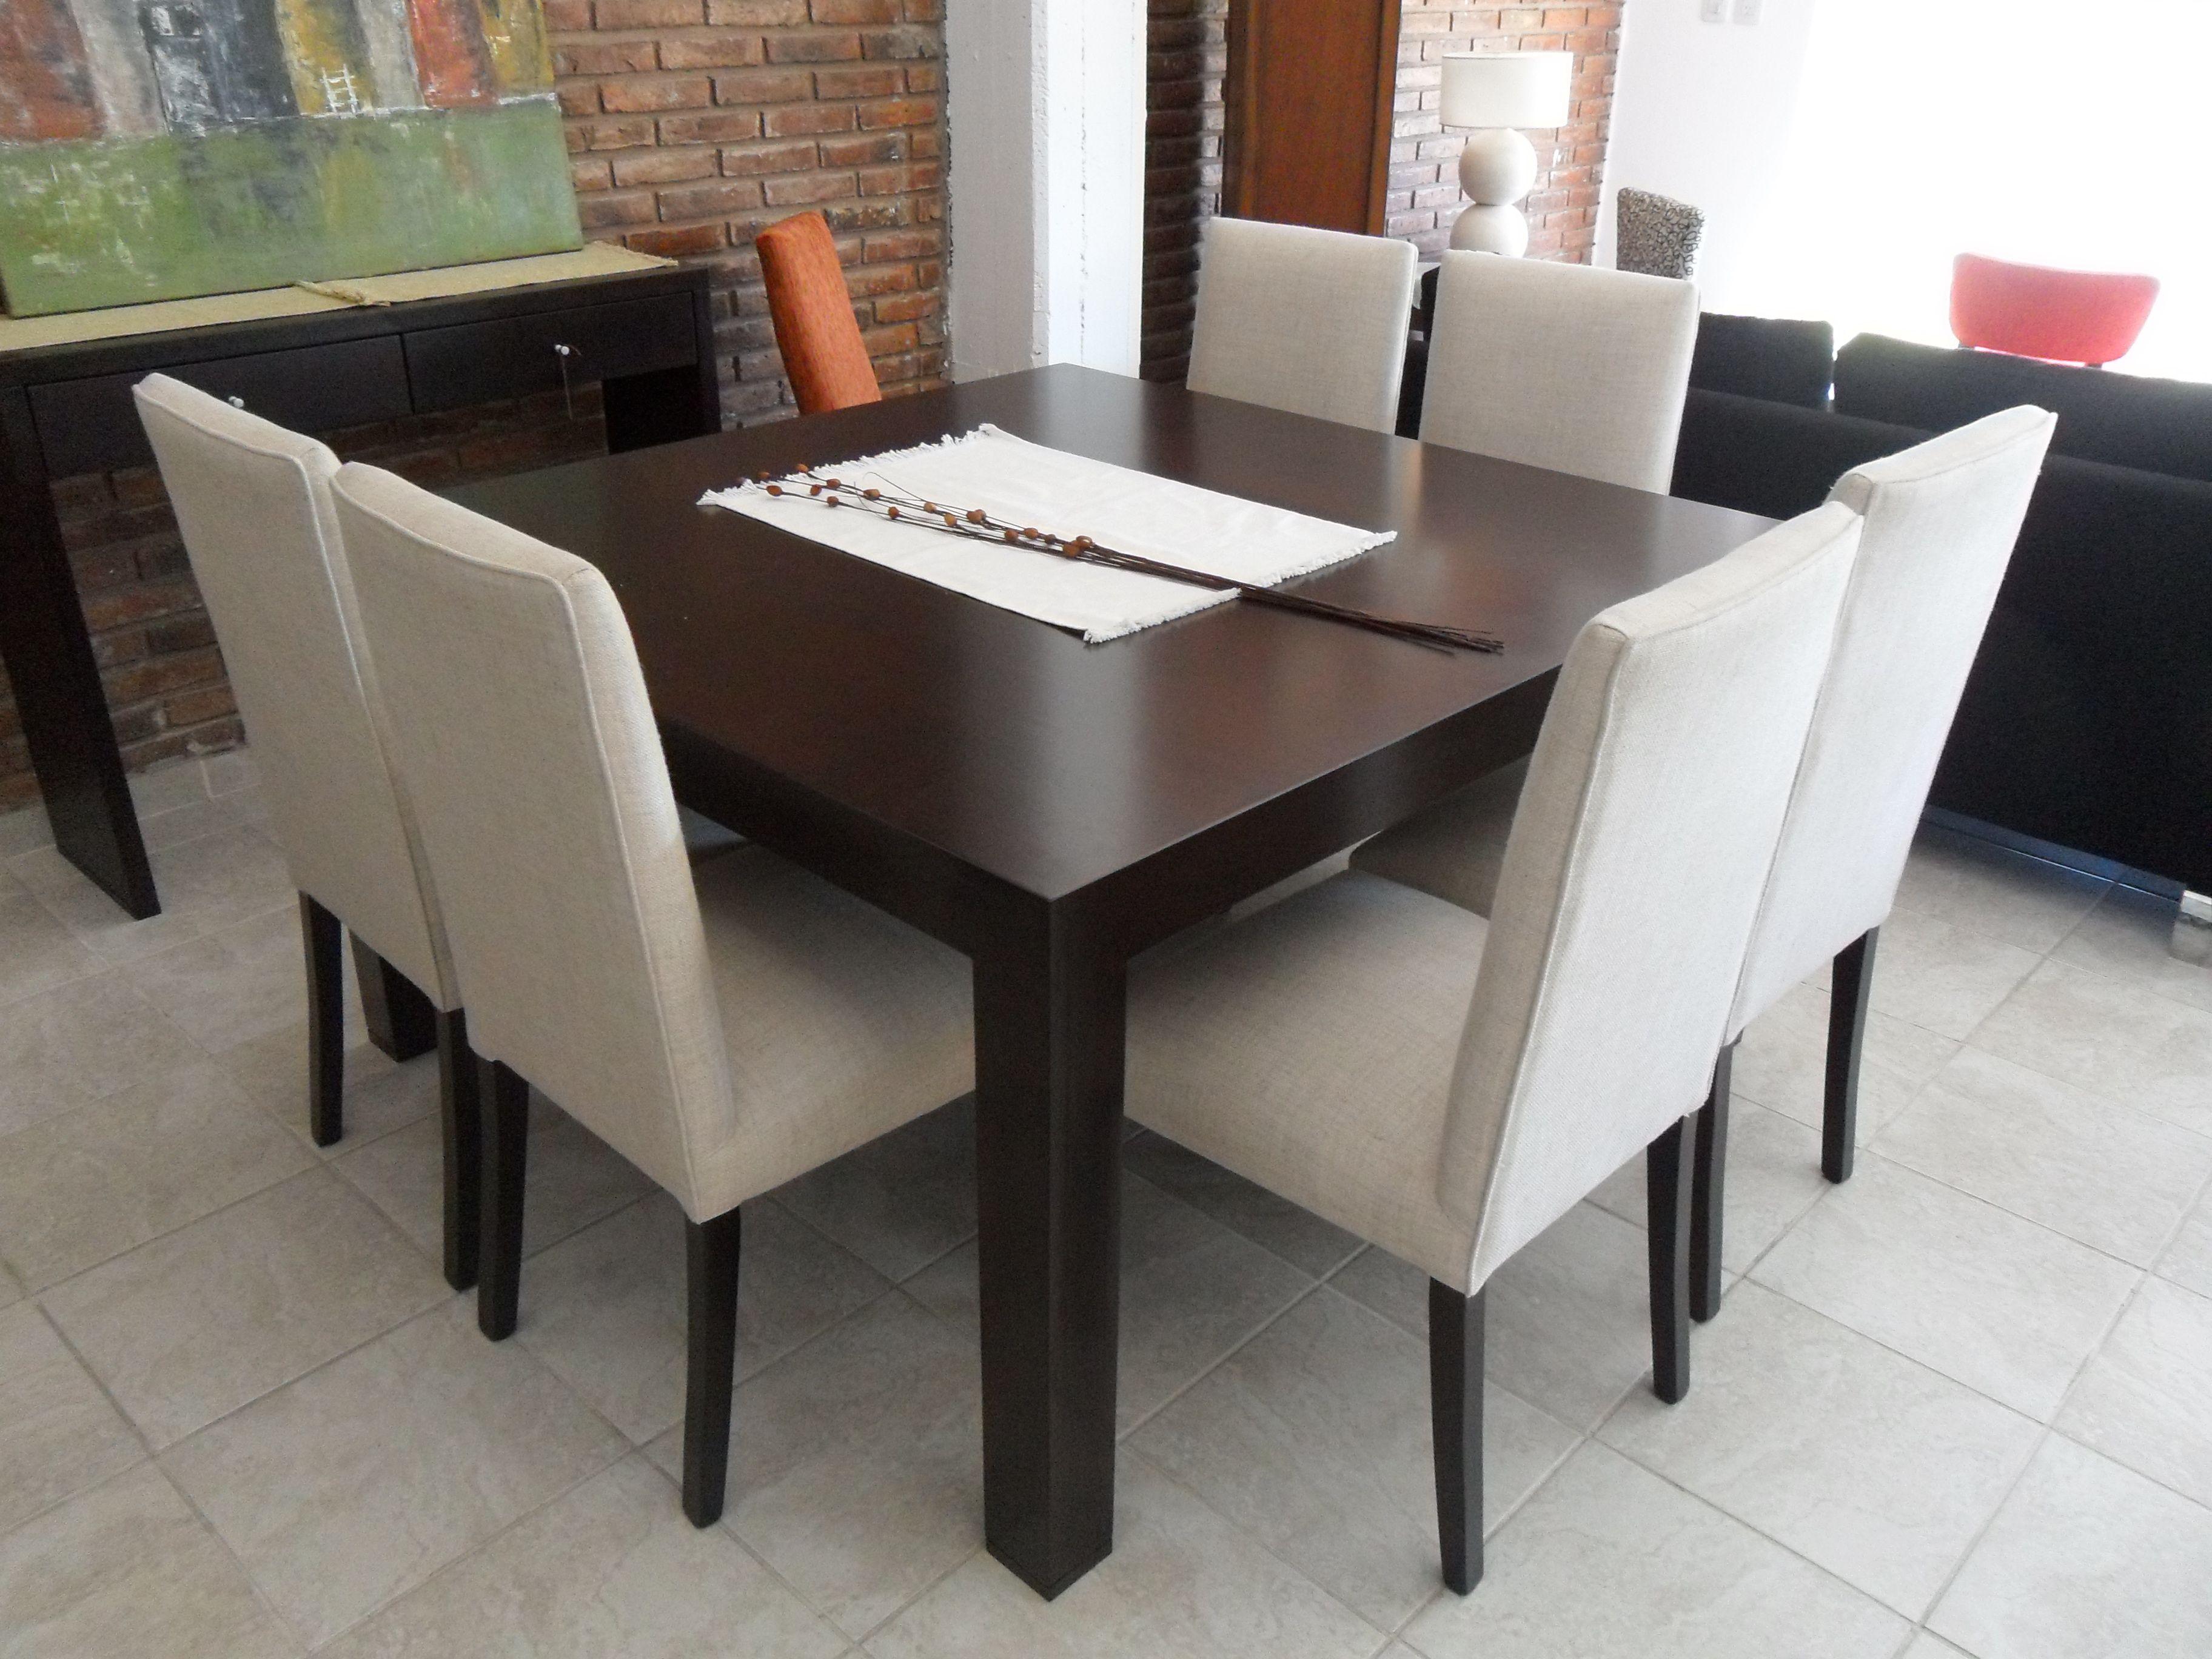 mesa recto con silla punta cuadrada altos | Comedor | Pinterest ...